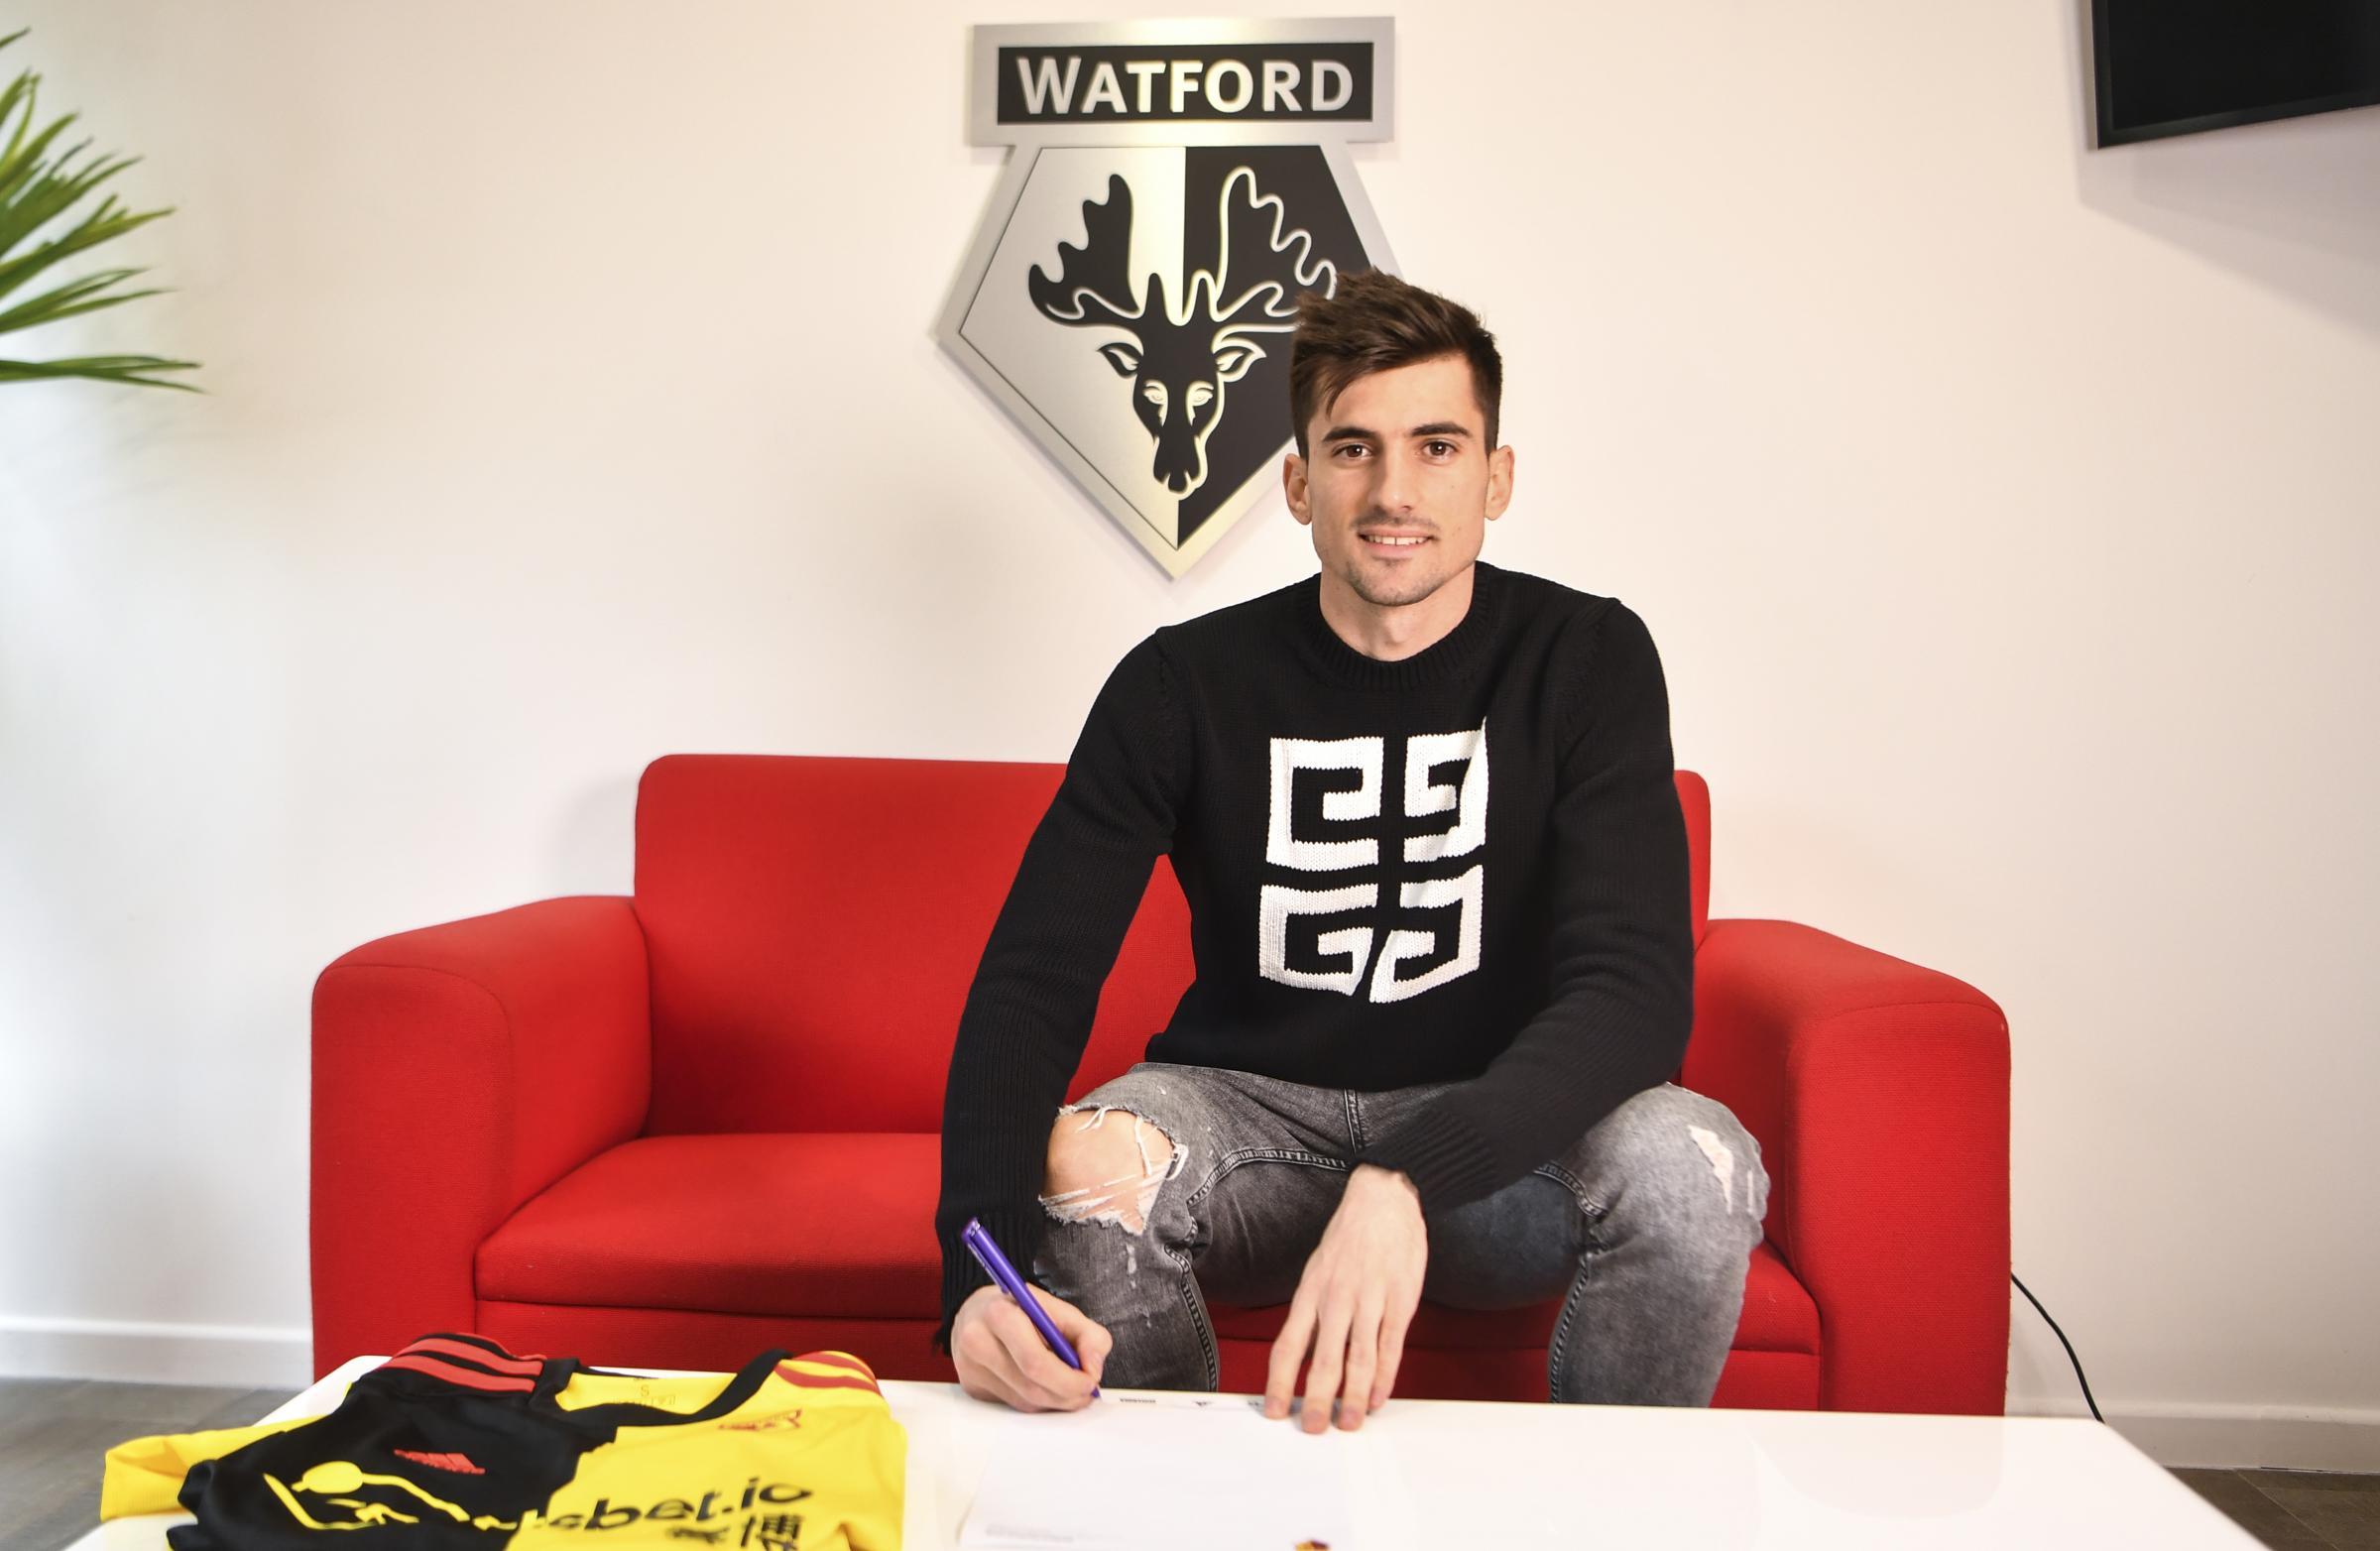 New Watford signing Ignacio Pussetto could feature against Tottenham Hotspur